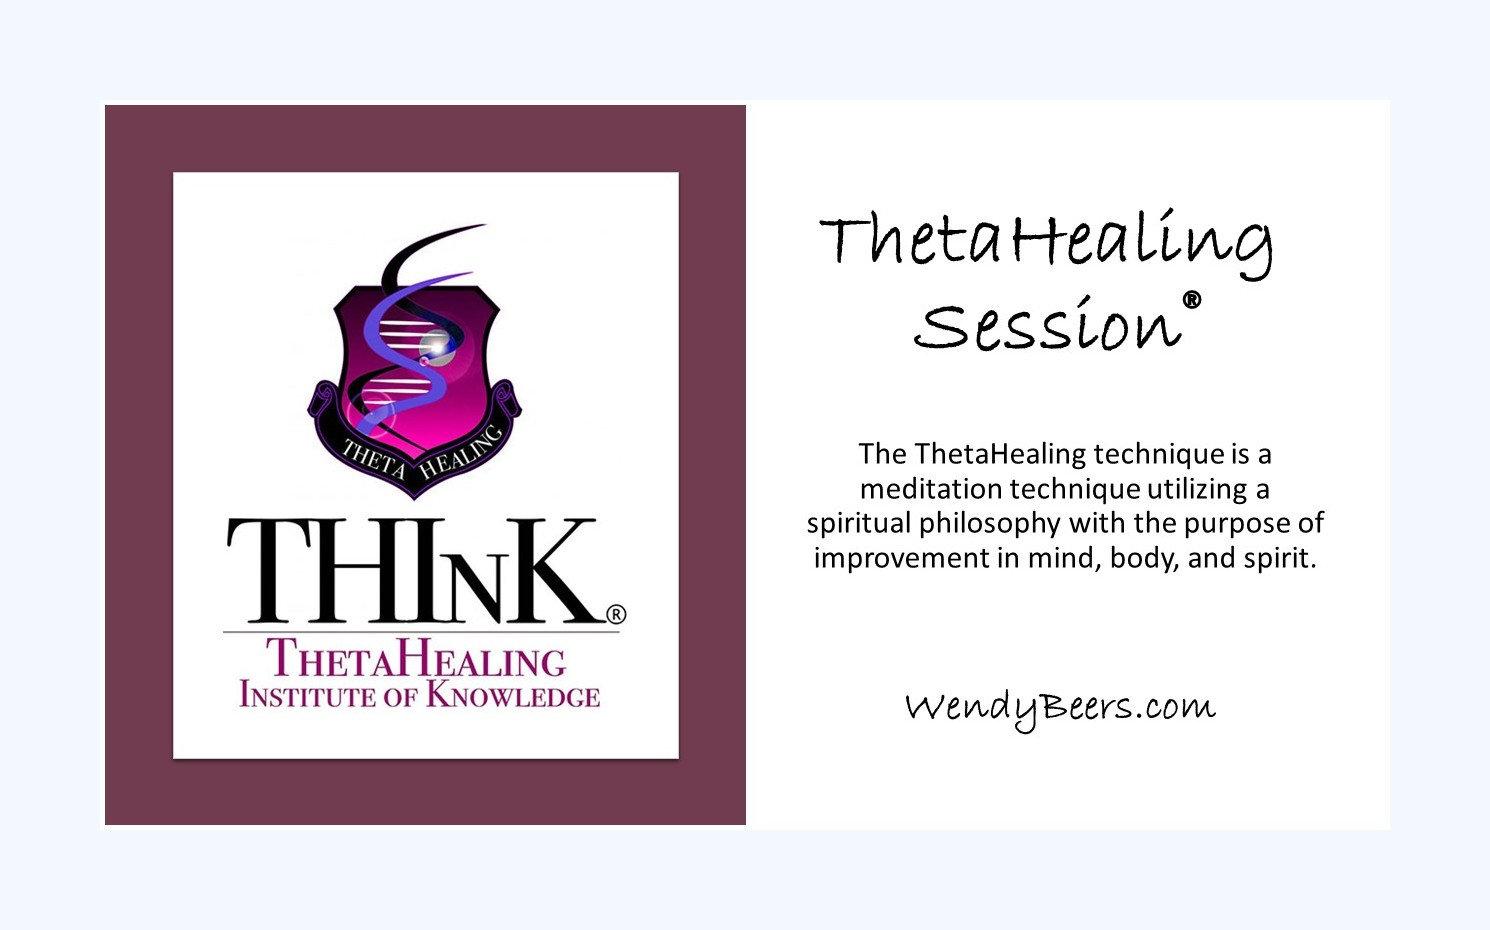 ThetaHealing® Session